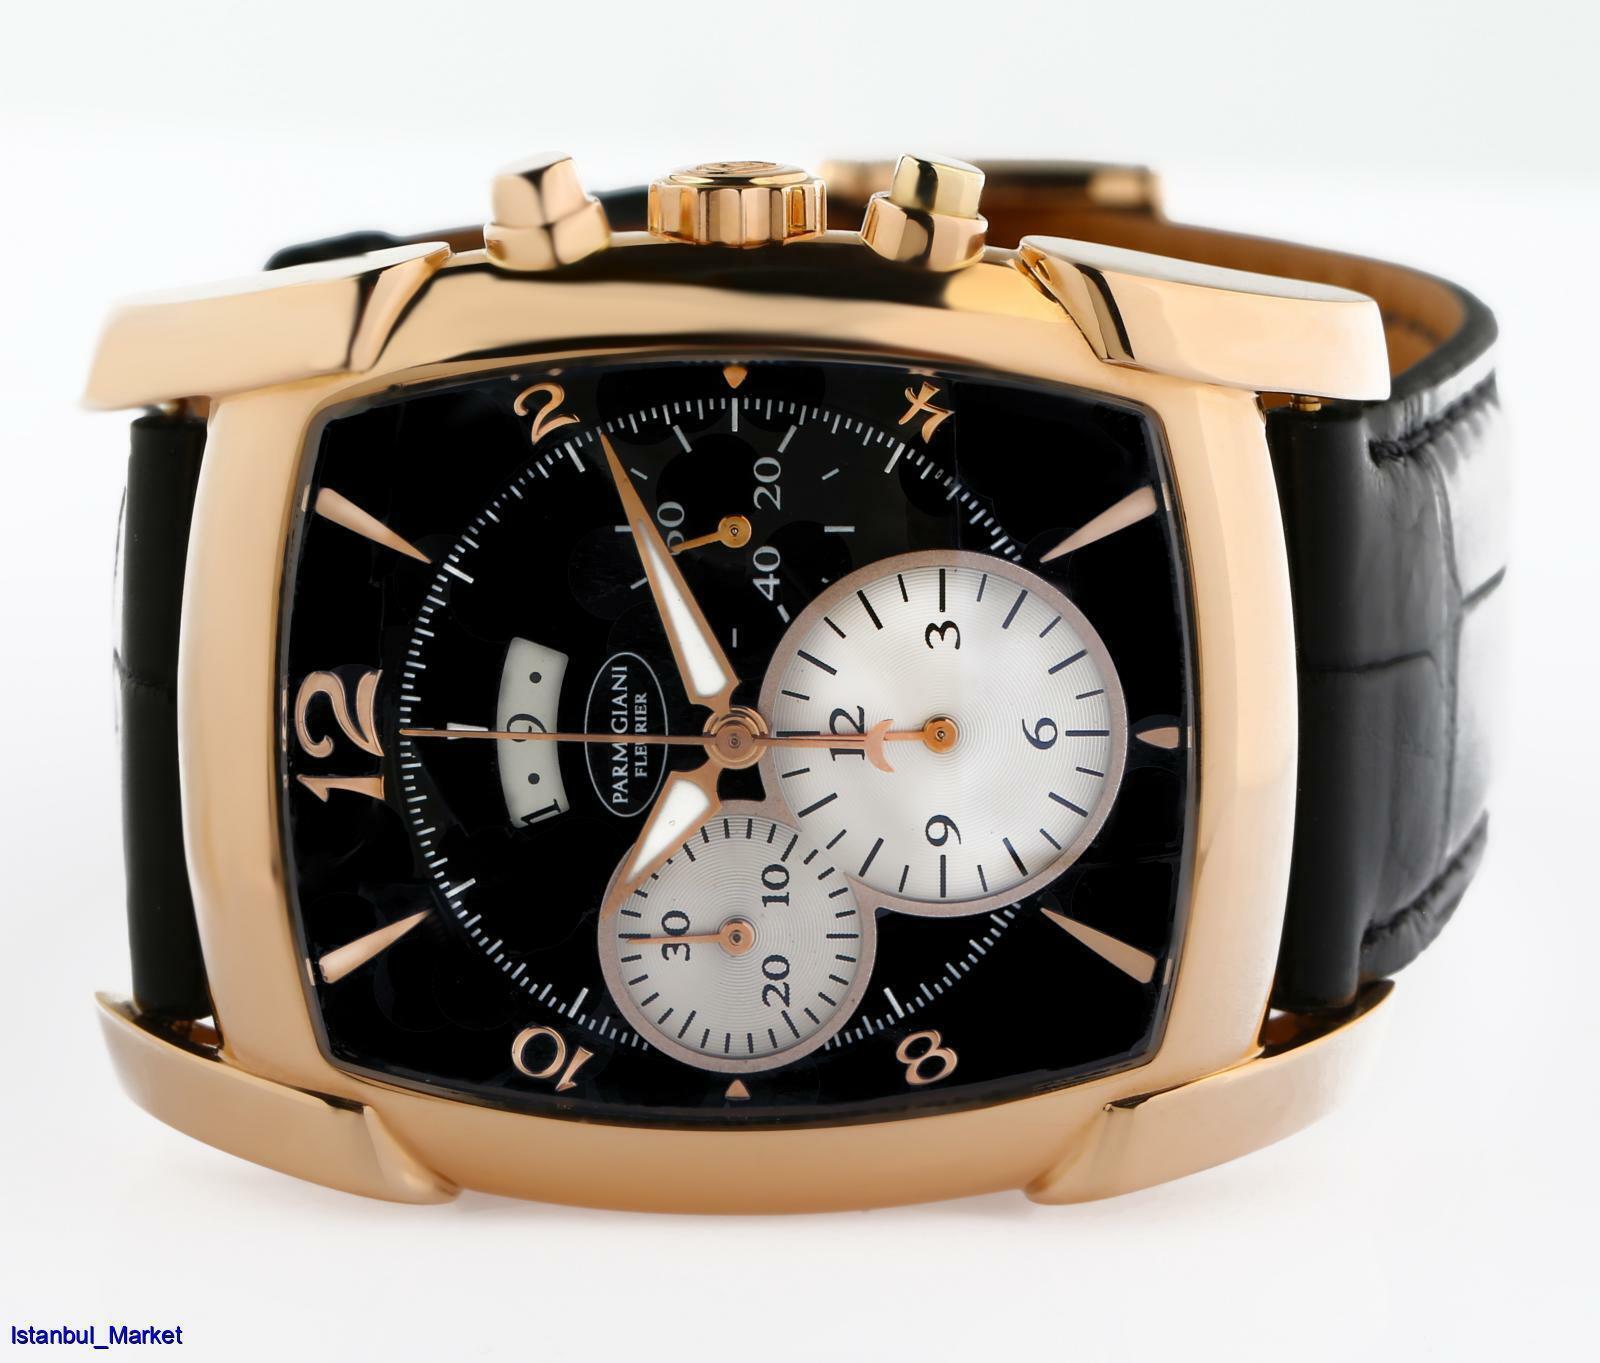 Parmigiani Fleurier Kalpagraph Ref# PFC128 18k Rose Gold Chronograph Wristwatch - watch picture 1